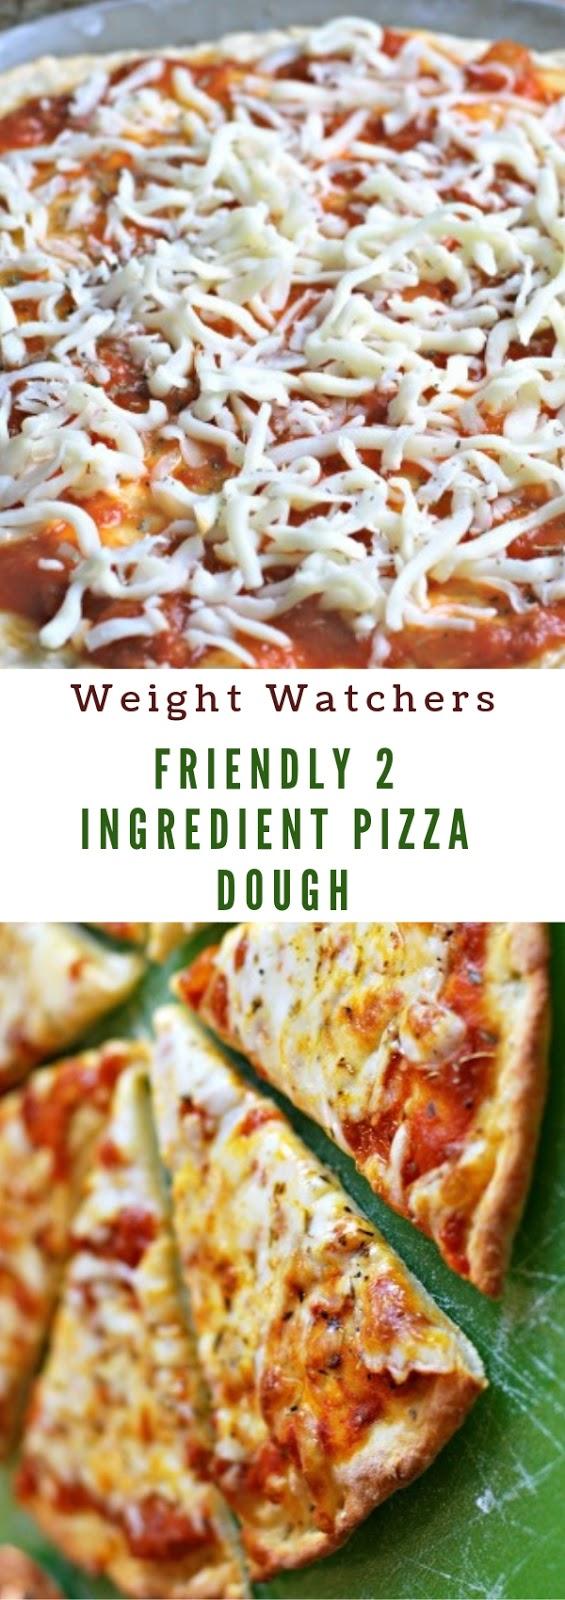 Weight Watchers Friendly 2 Ingredient Pizza Dough #slidedish #appetizer #weightwatchers #2ingredient #pizza #dough